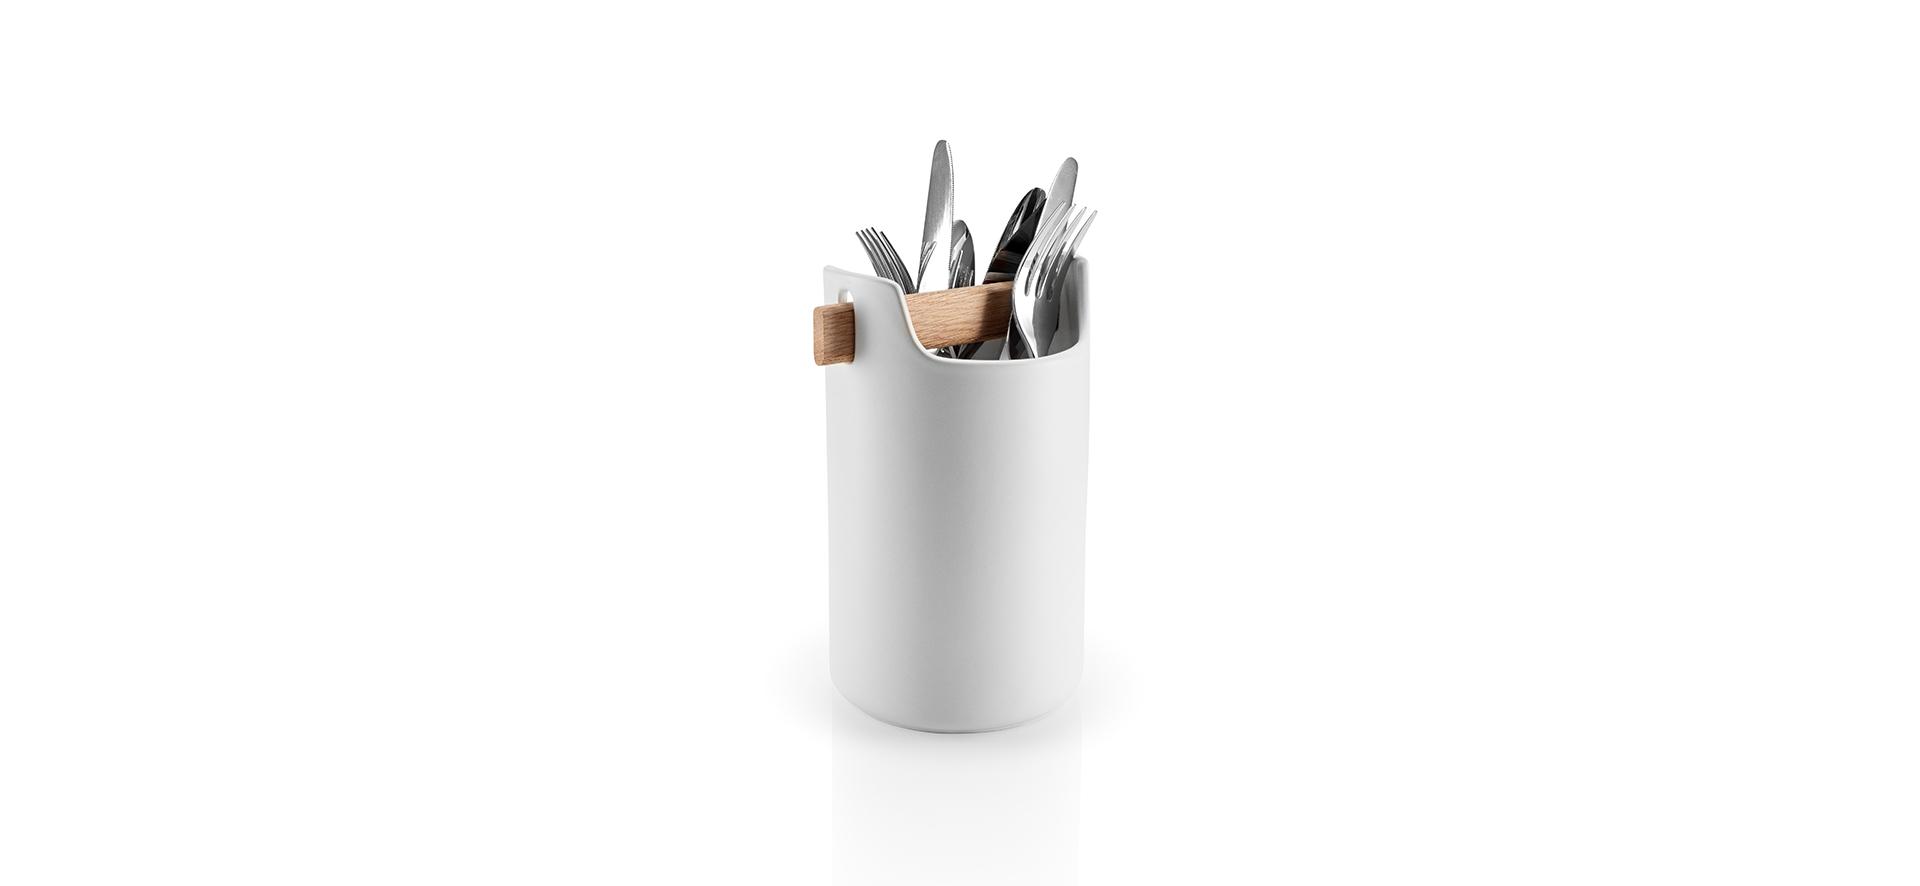 Full Size of Toolbo530637 Küchen Regal Aufbewahrungsbehälter Küche Wohnzimmer Küchen Aufbewahrungsbehälter